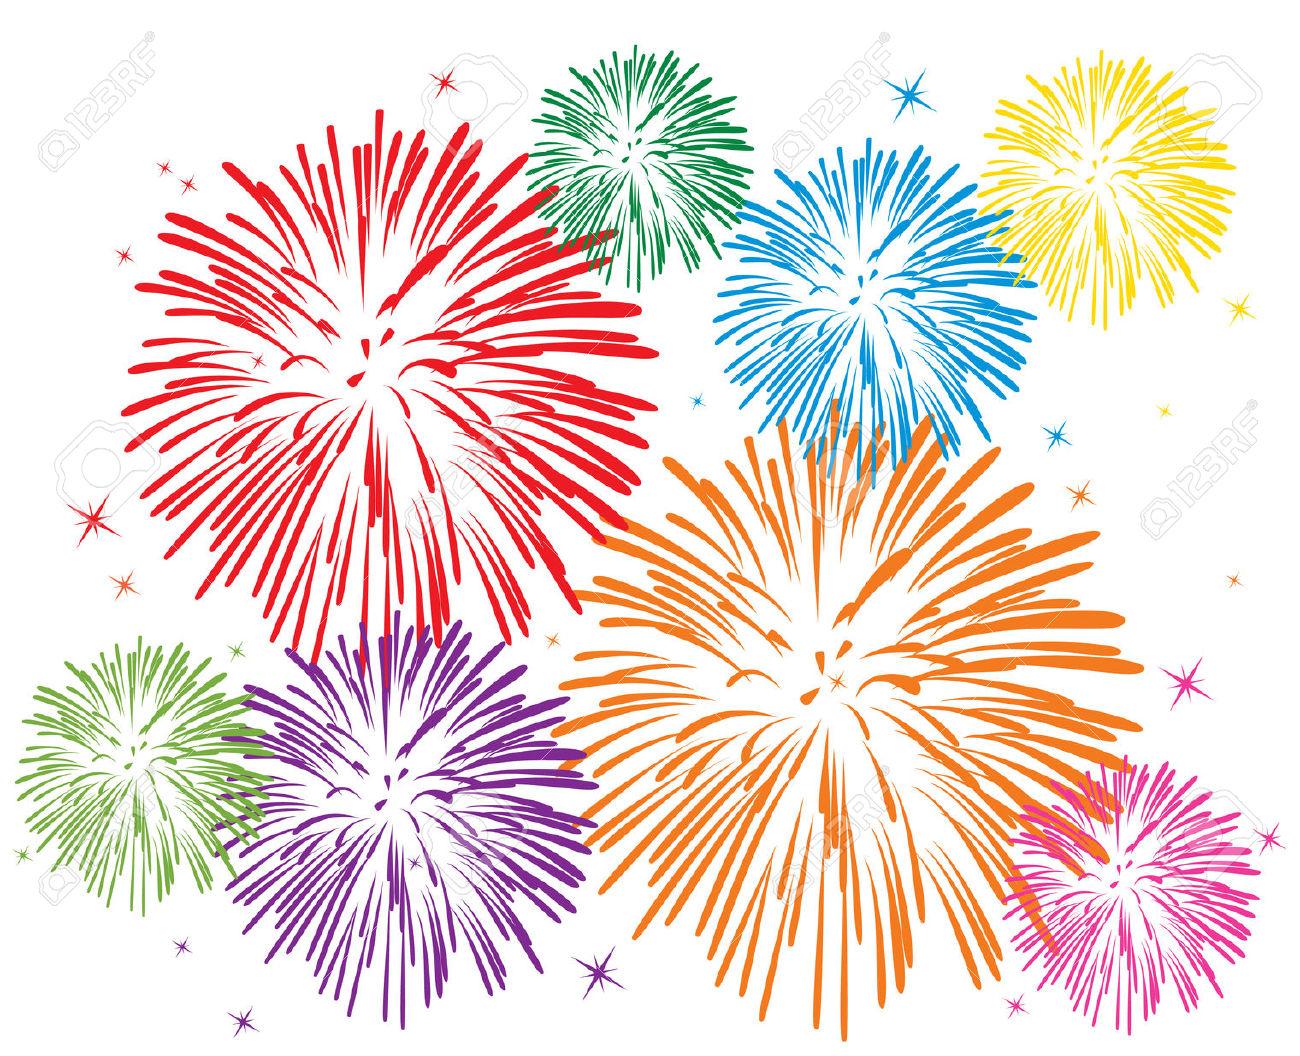 Clipart Fireworks & Fireworks Clip Art Images.